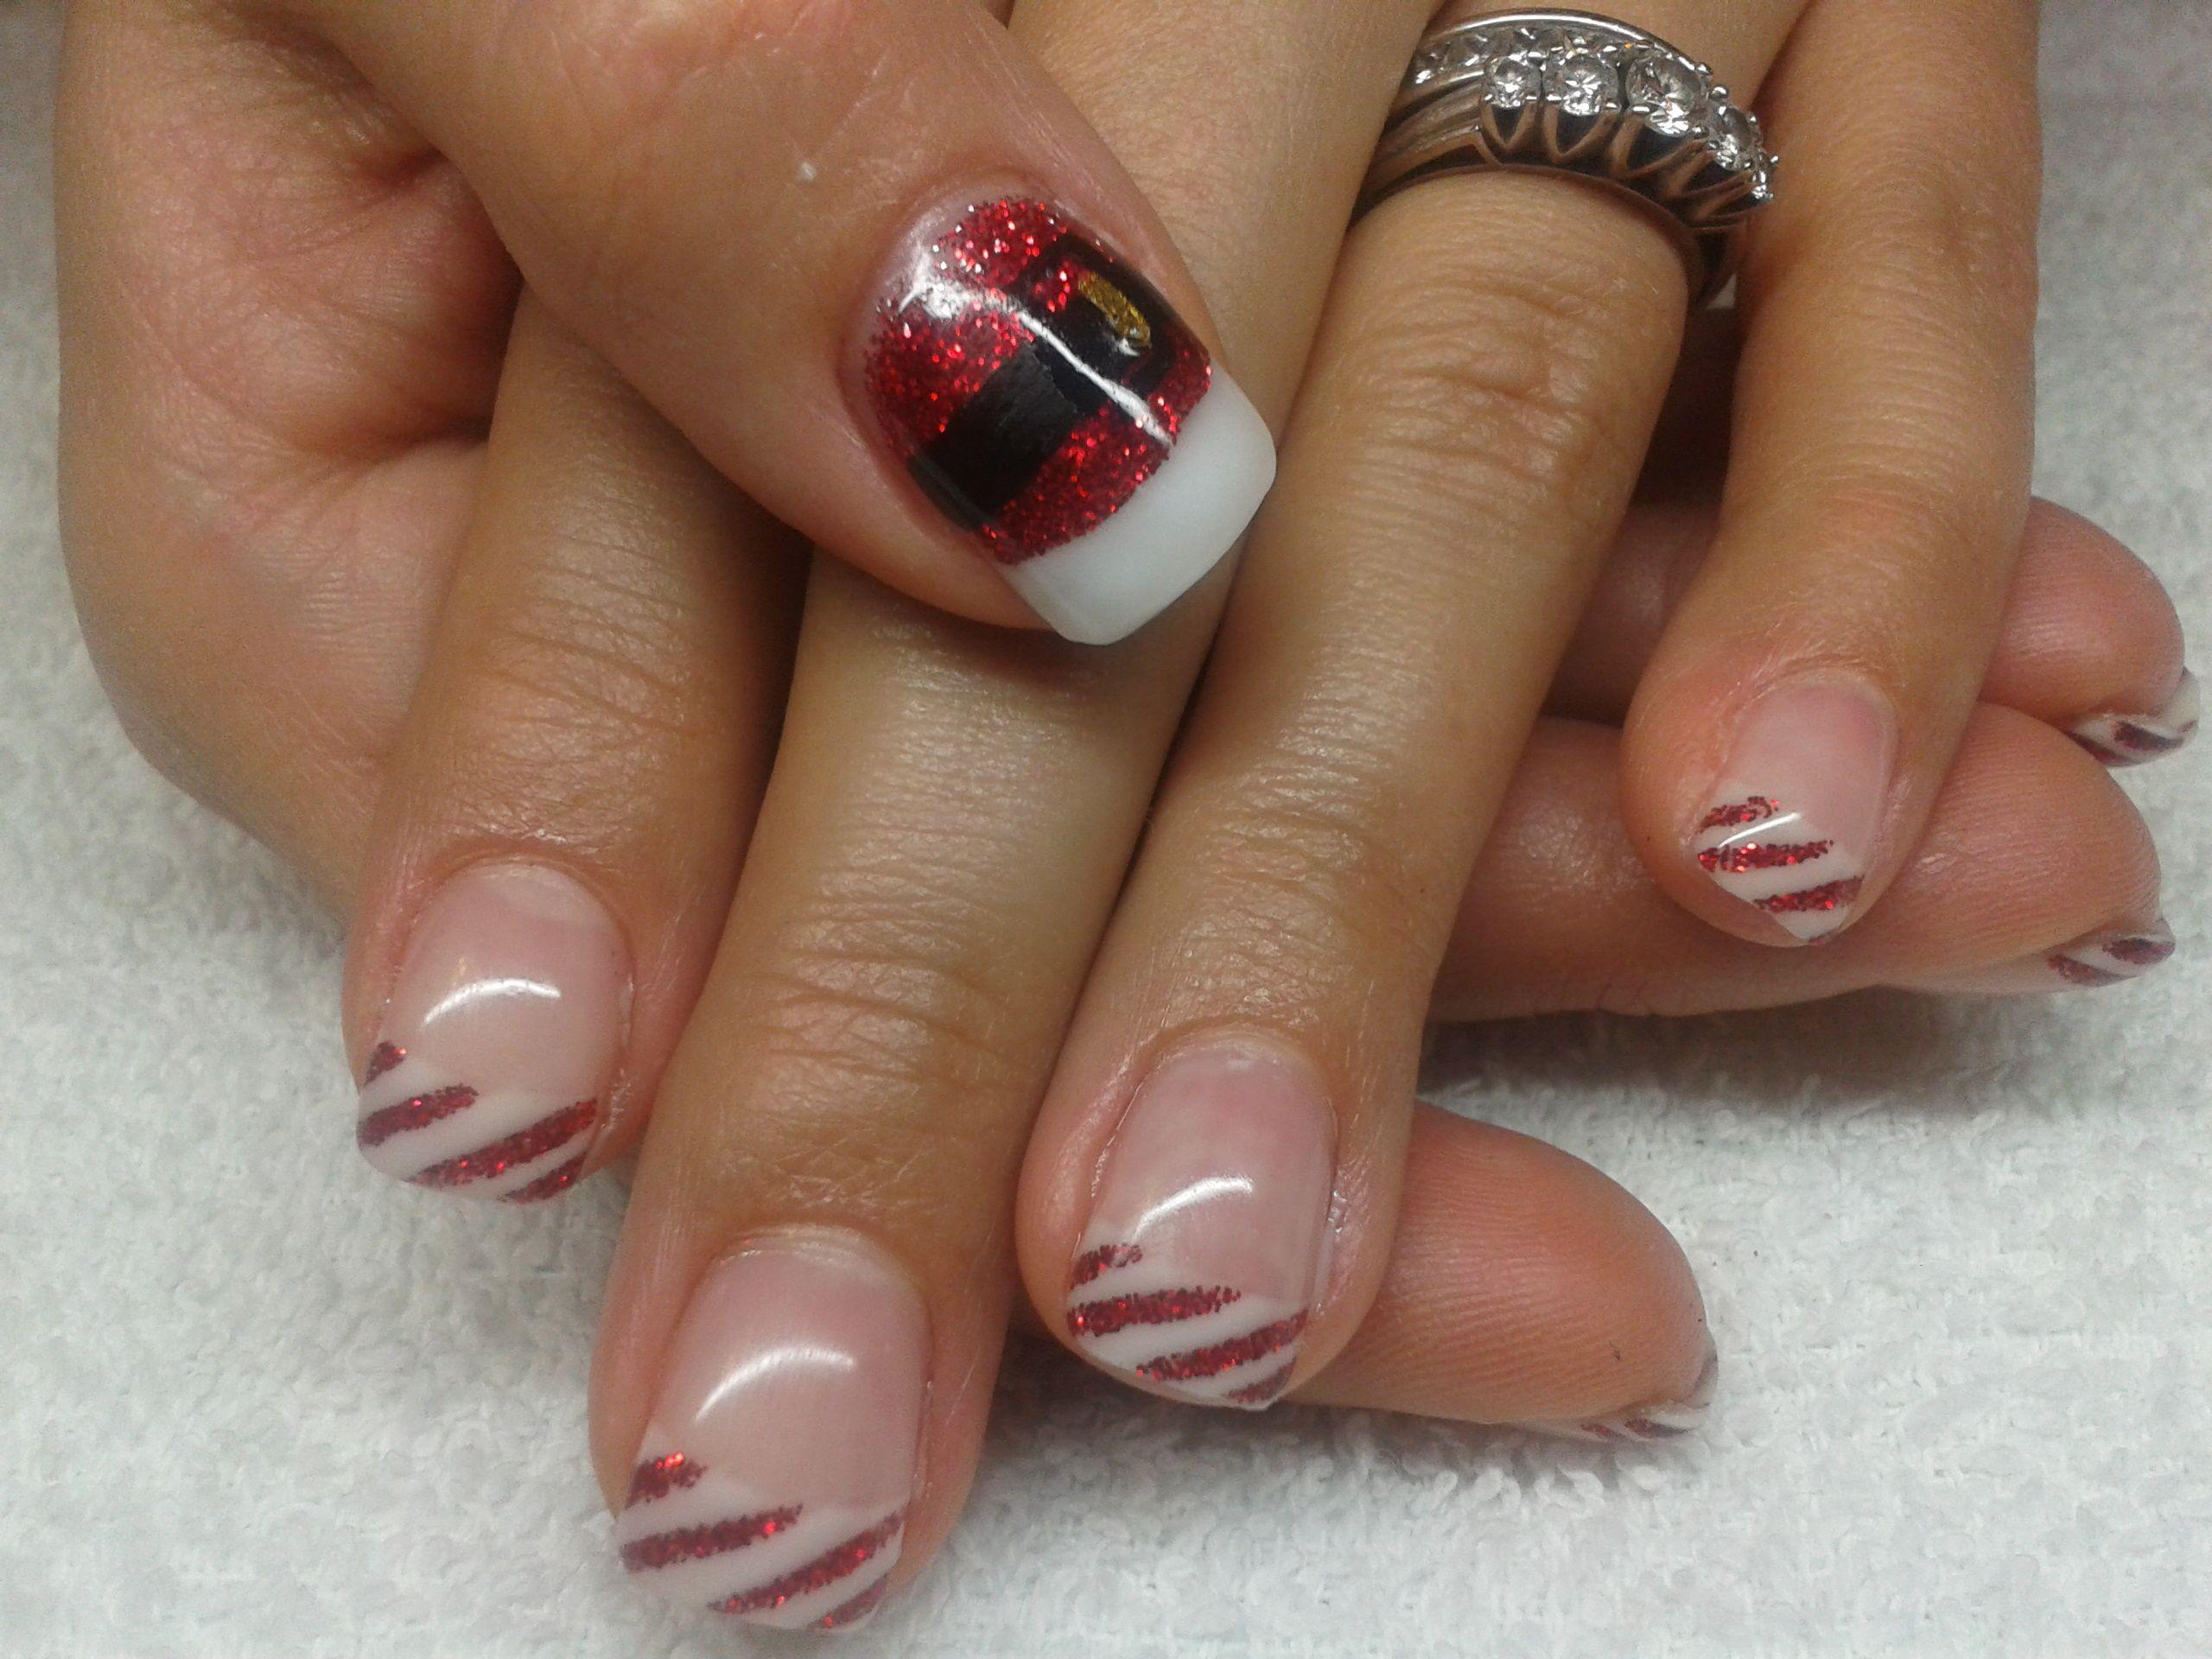 candycane & santa's belt nails